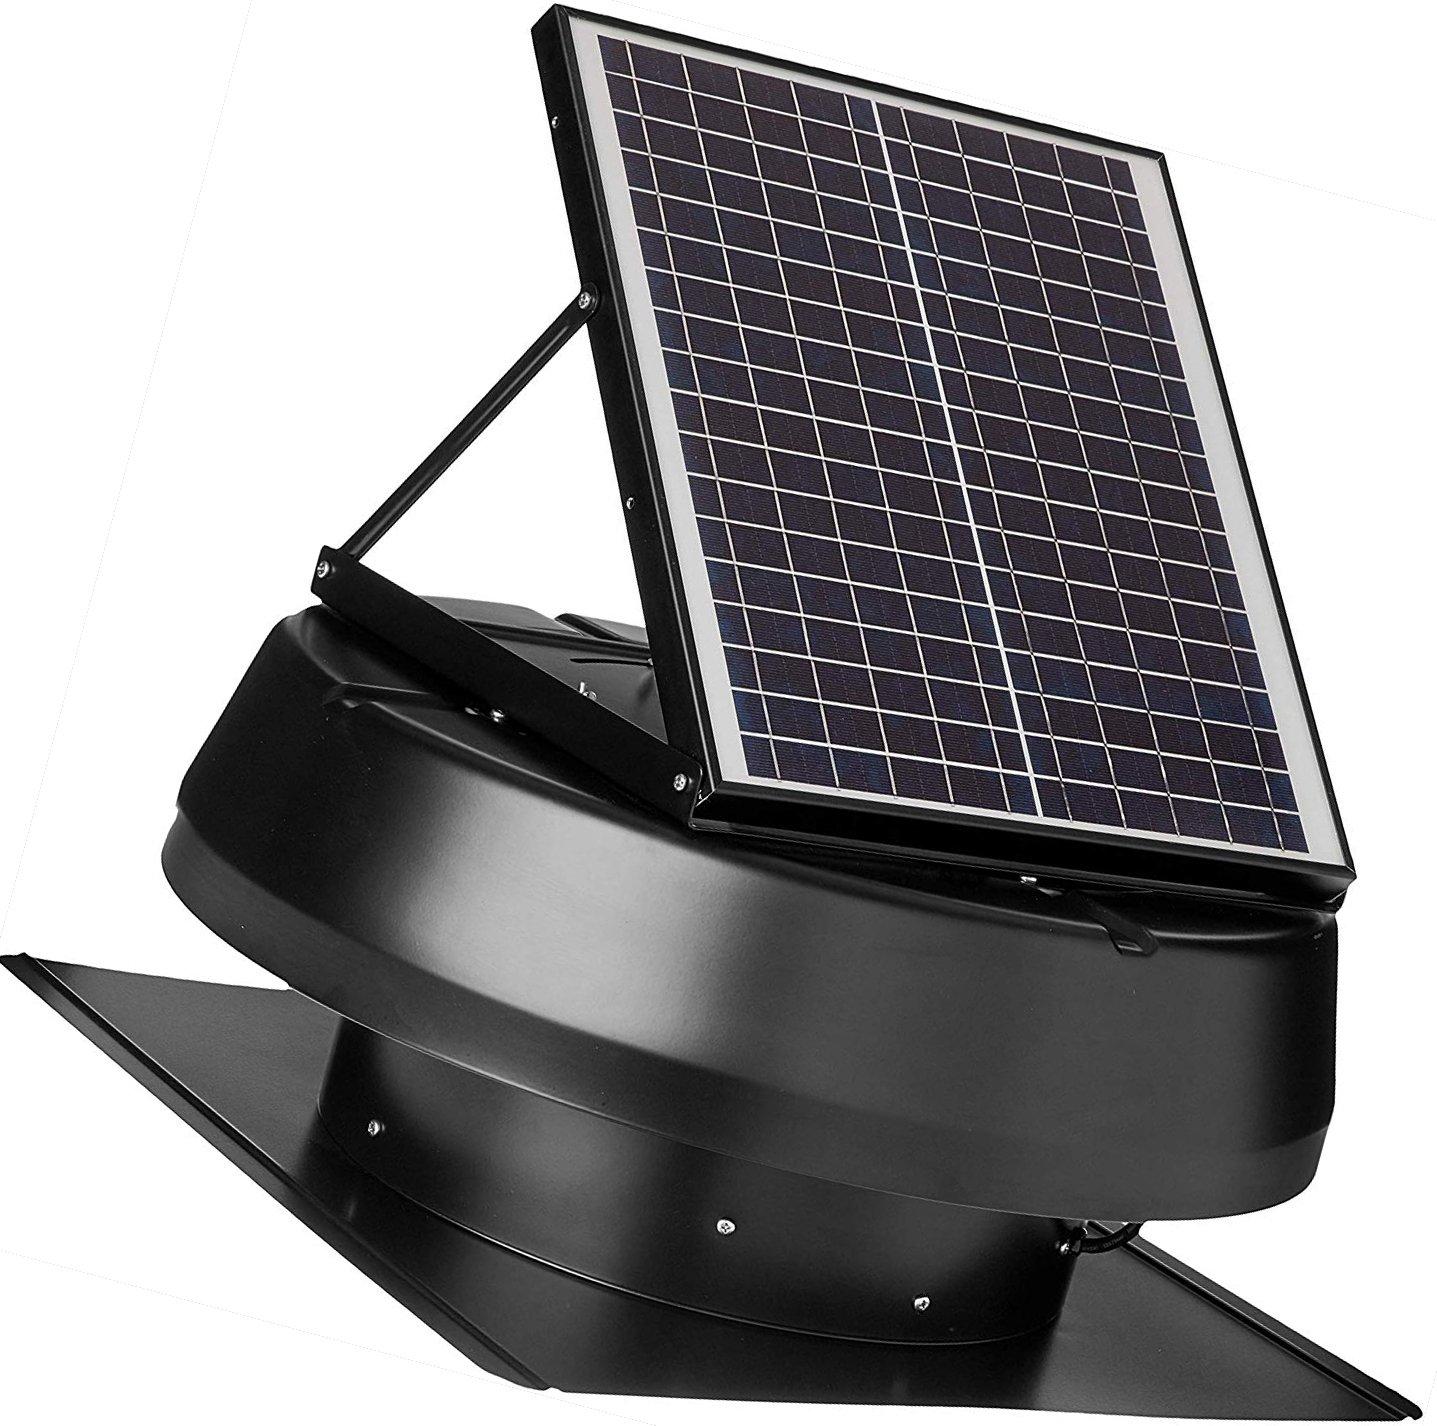 solar roof attic exhaust fan by iliving